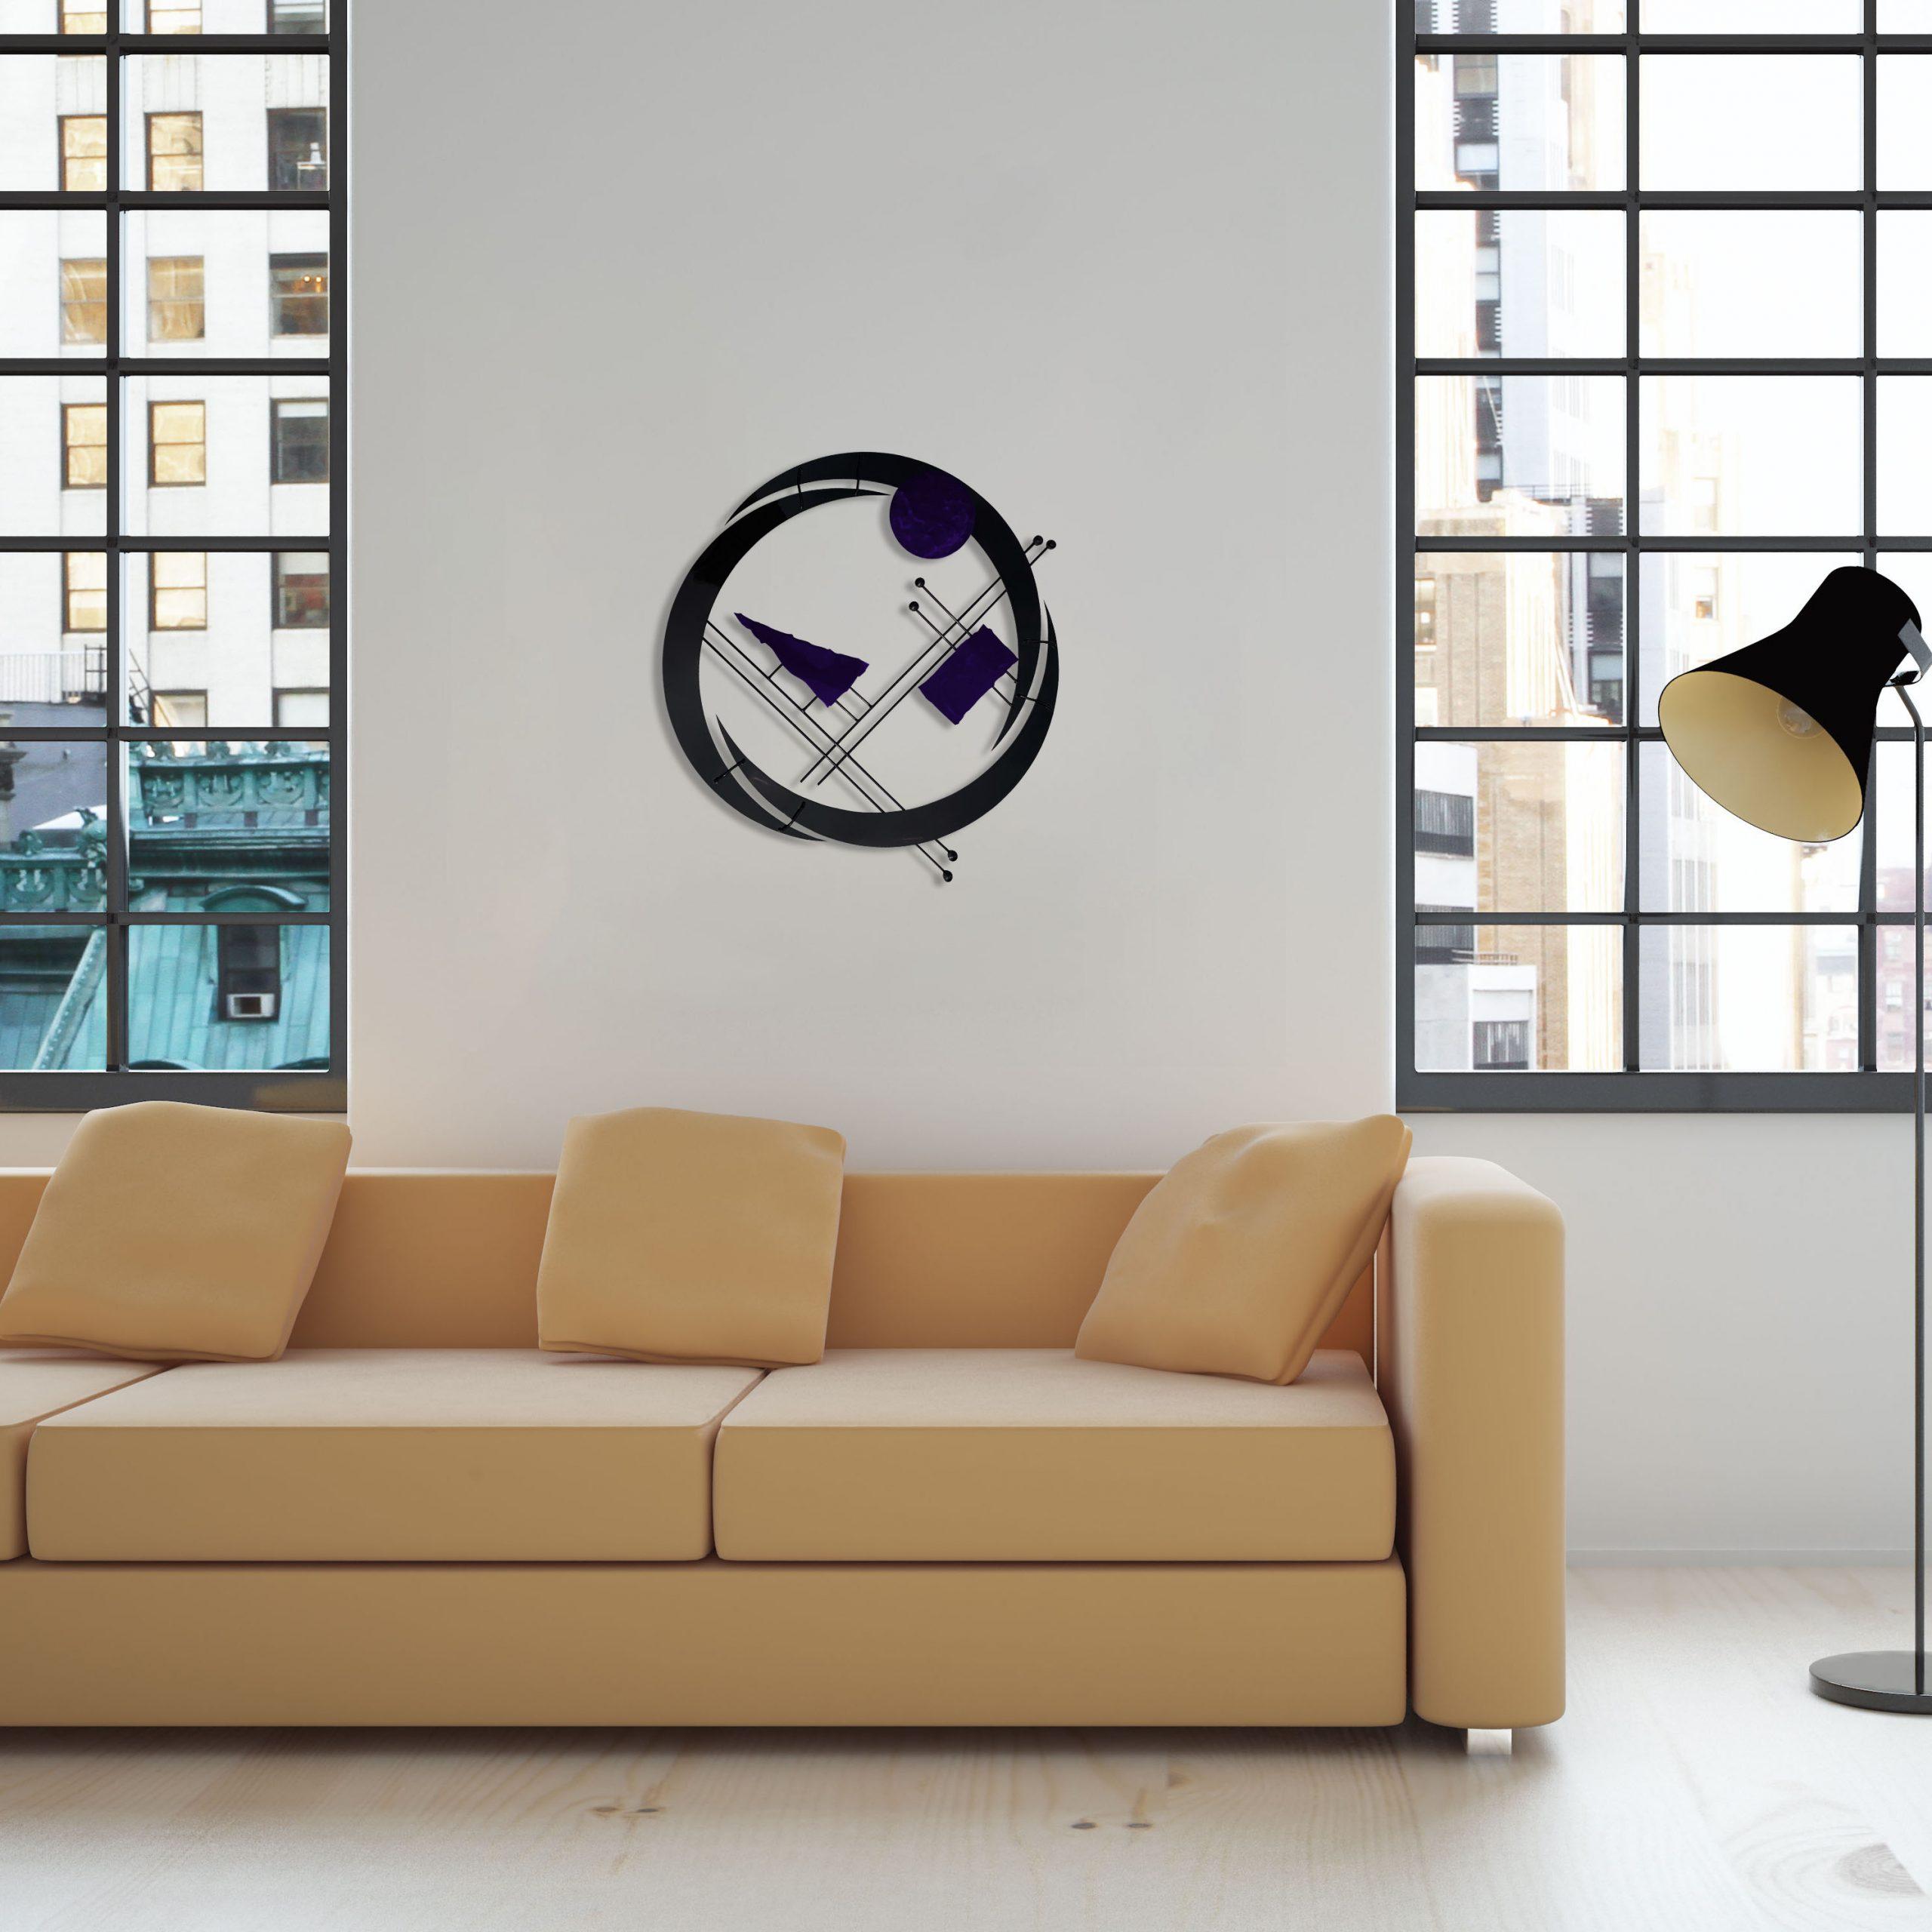 purple-Swirl-in-living-room-scaled